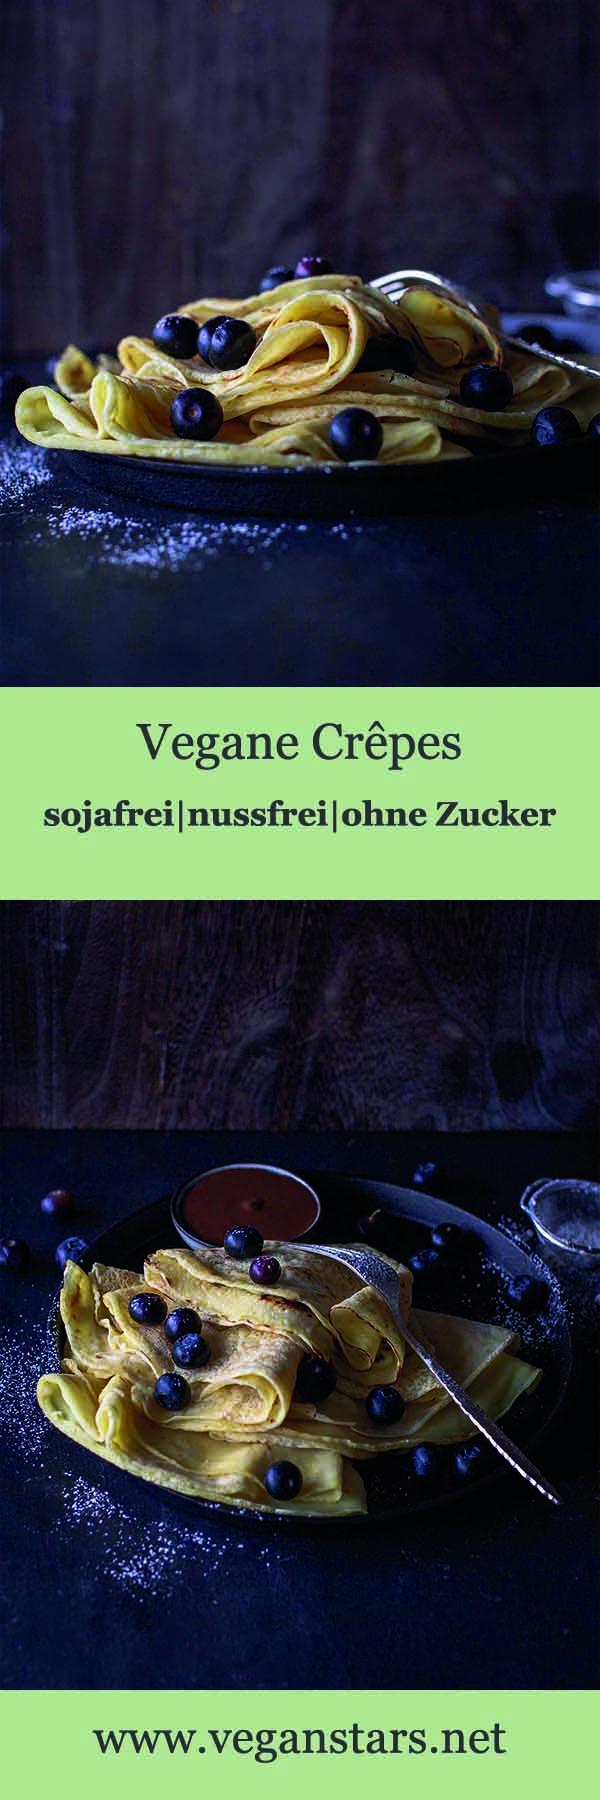 Vegane Crêpes